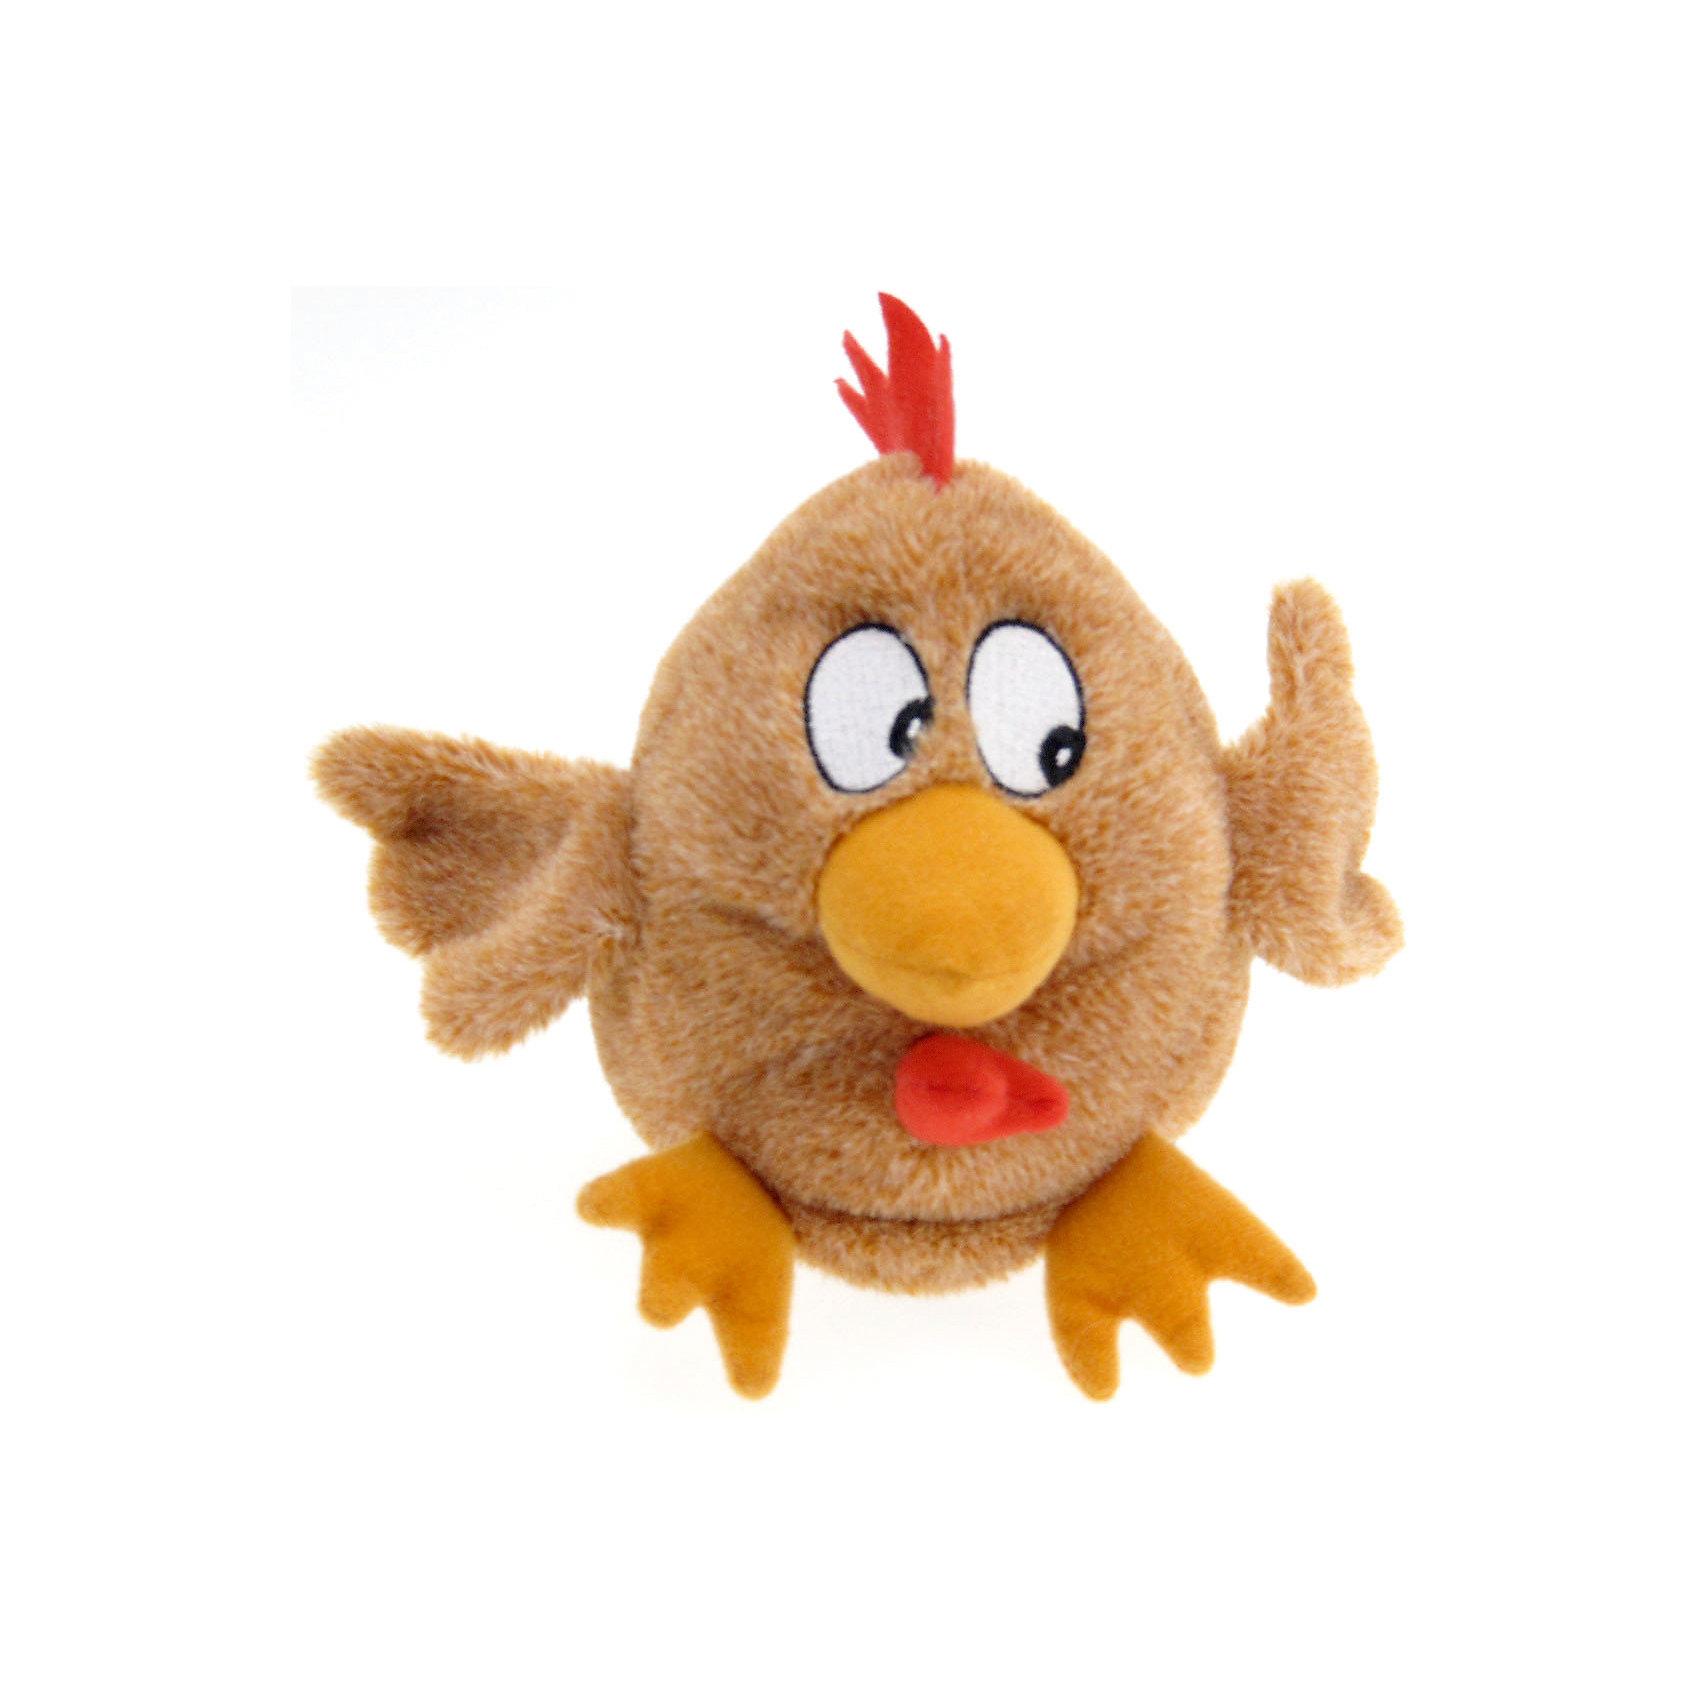 Woody O'Time Игрушка Mini Animals Balls Петух, Woody O'Time мягкая игрушка интерактивная woody o time лошадка непоседа